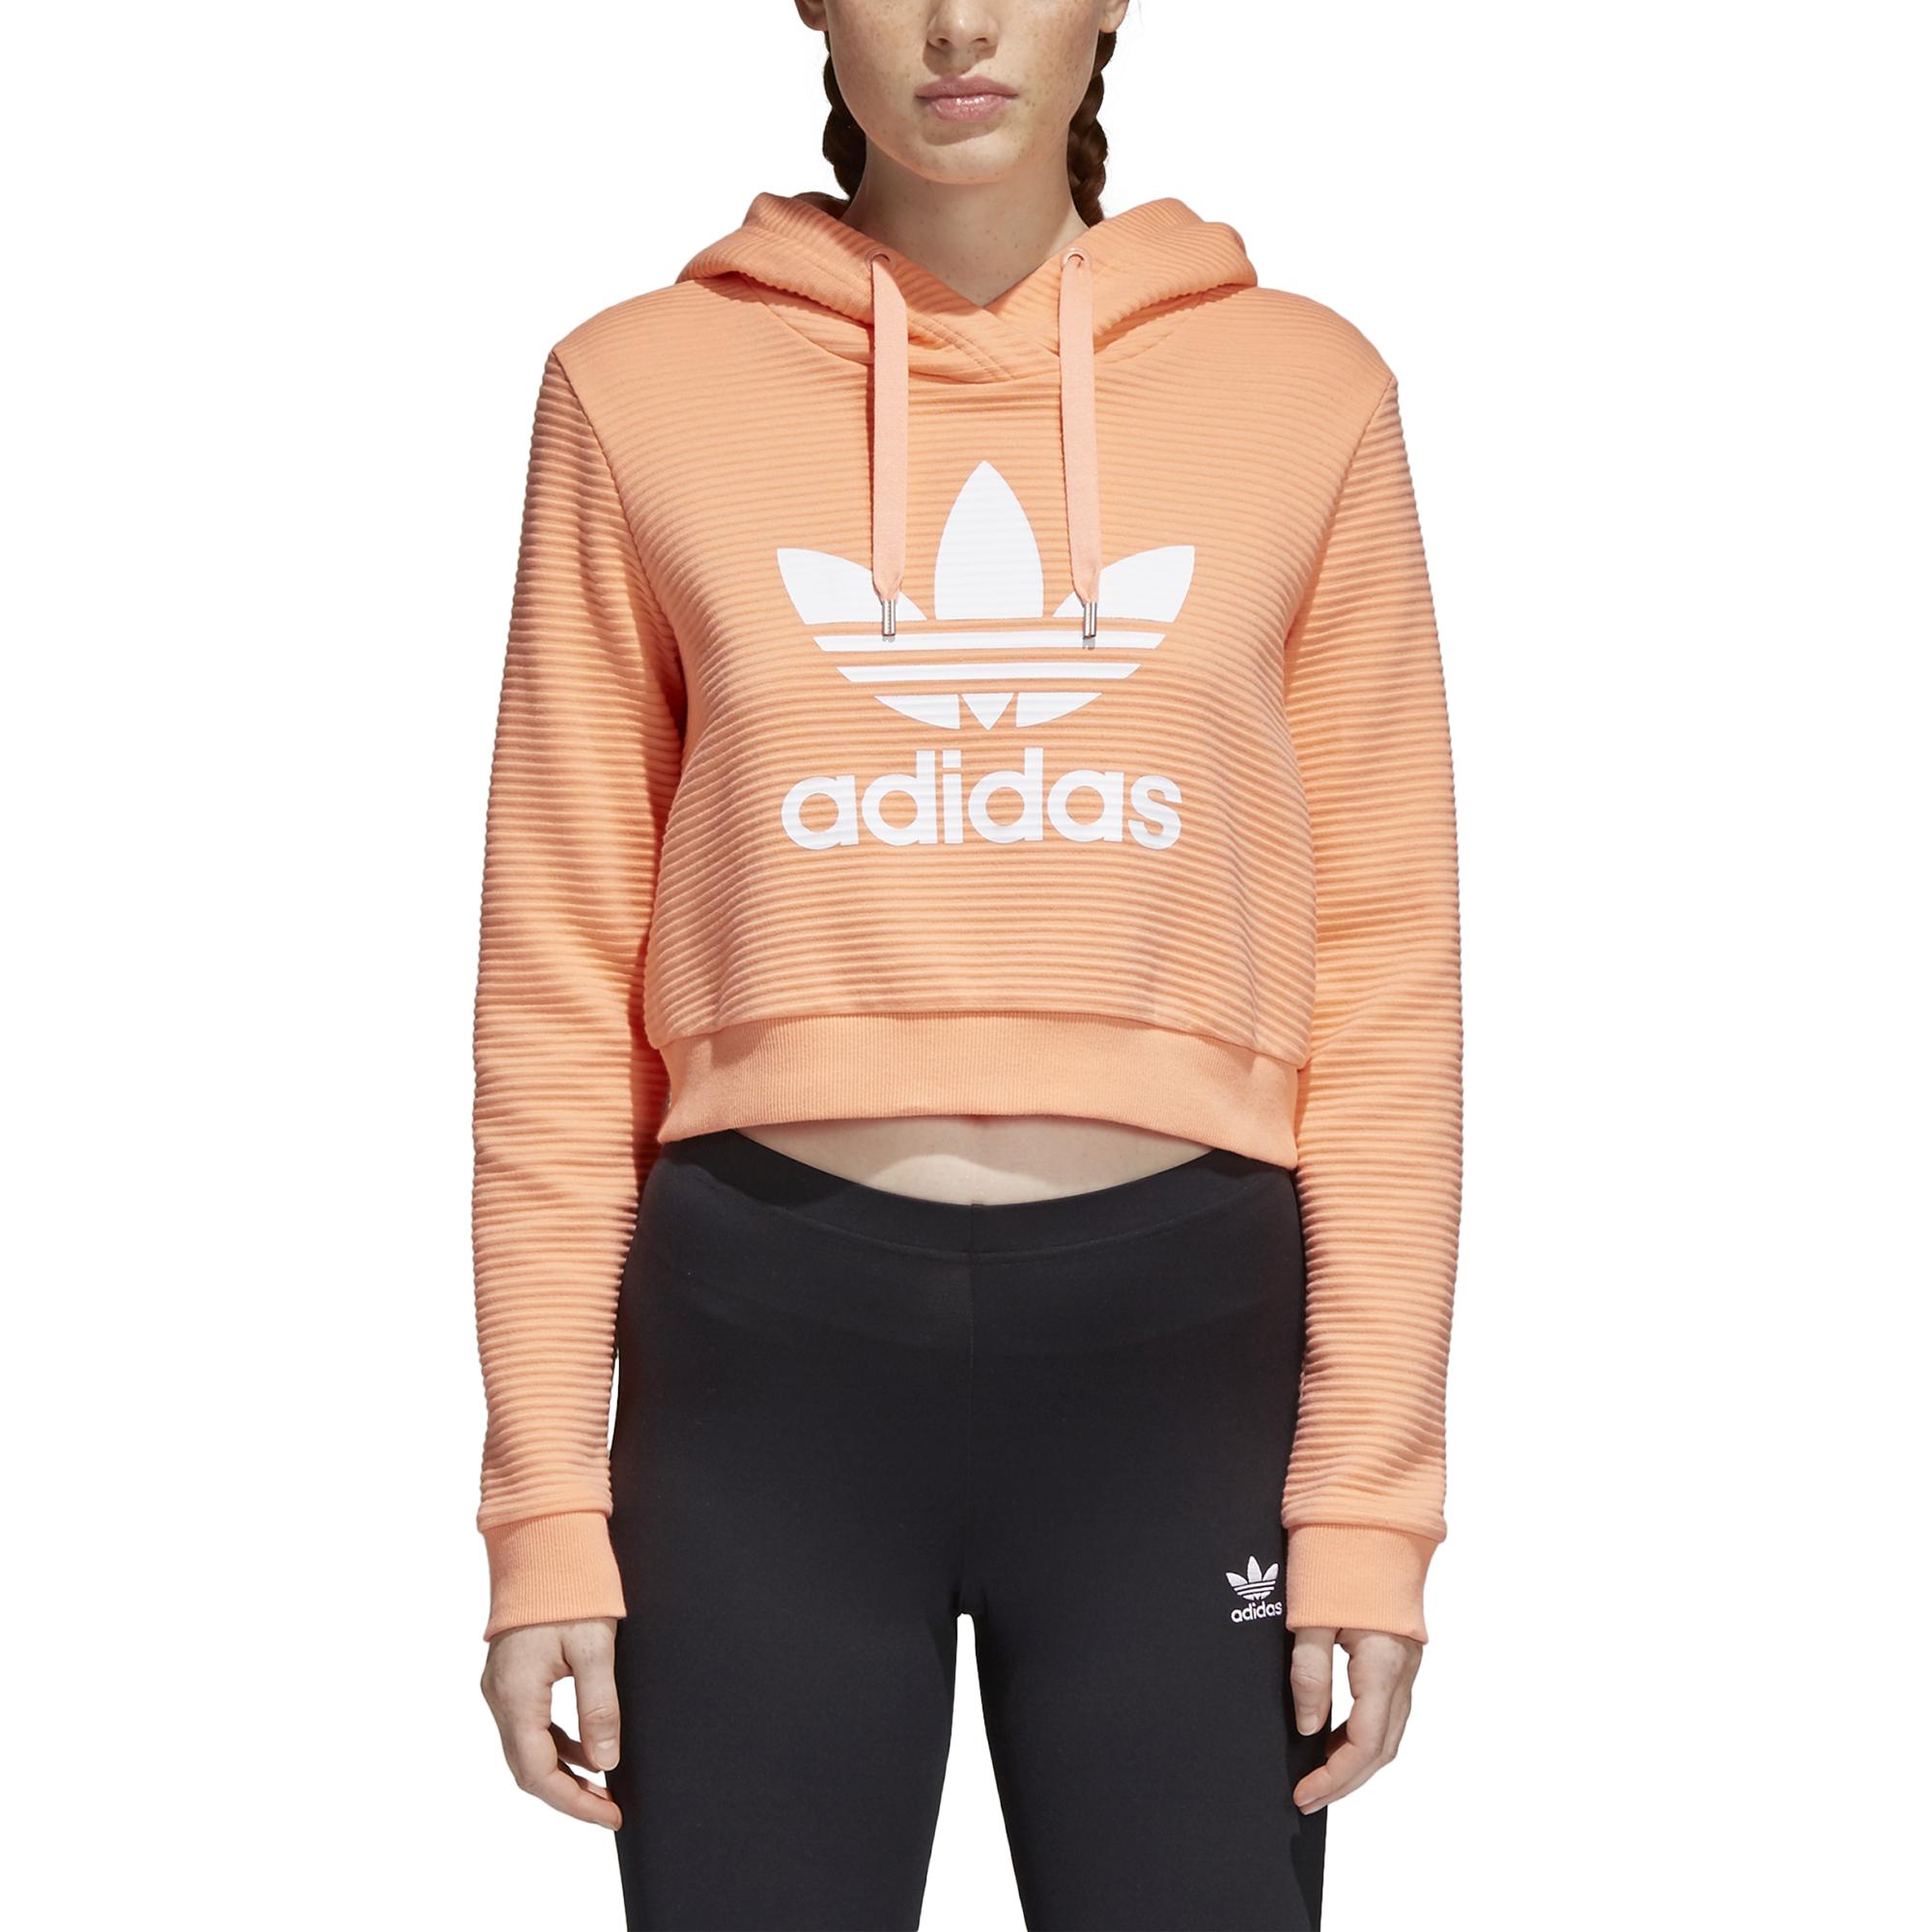 14f4501dbb9a2 Adidas Womens Cropped Trefoil Hoodie Chalk Coral - Boardvillage